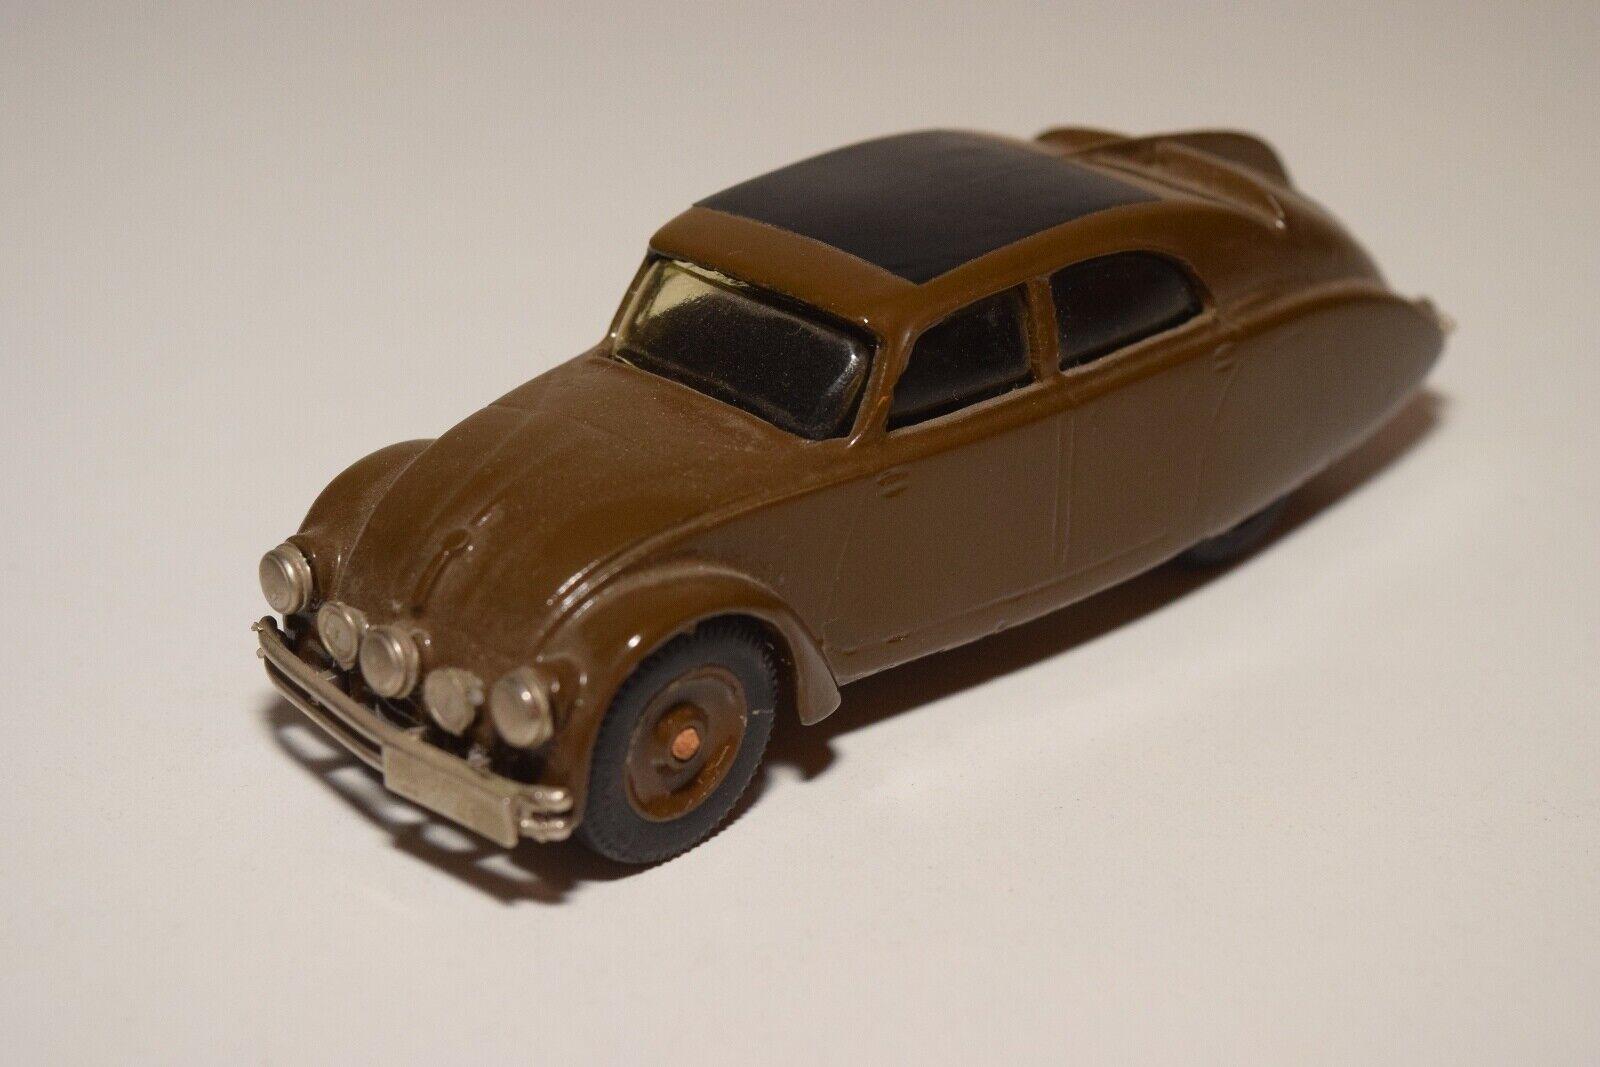 CC 1 43 AUTO REPLICAS KIT TATRA 77A 77 A A A 1936 BROWN NEAR MINT CONDITION 4c0d37